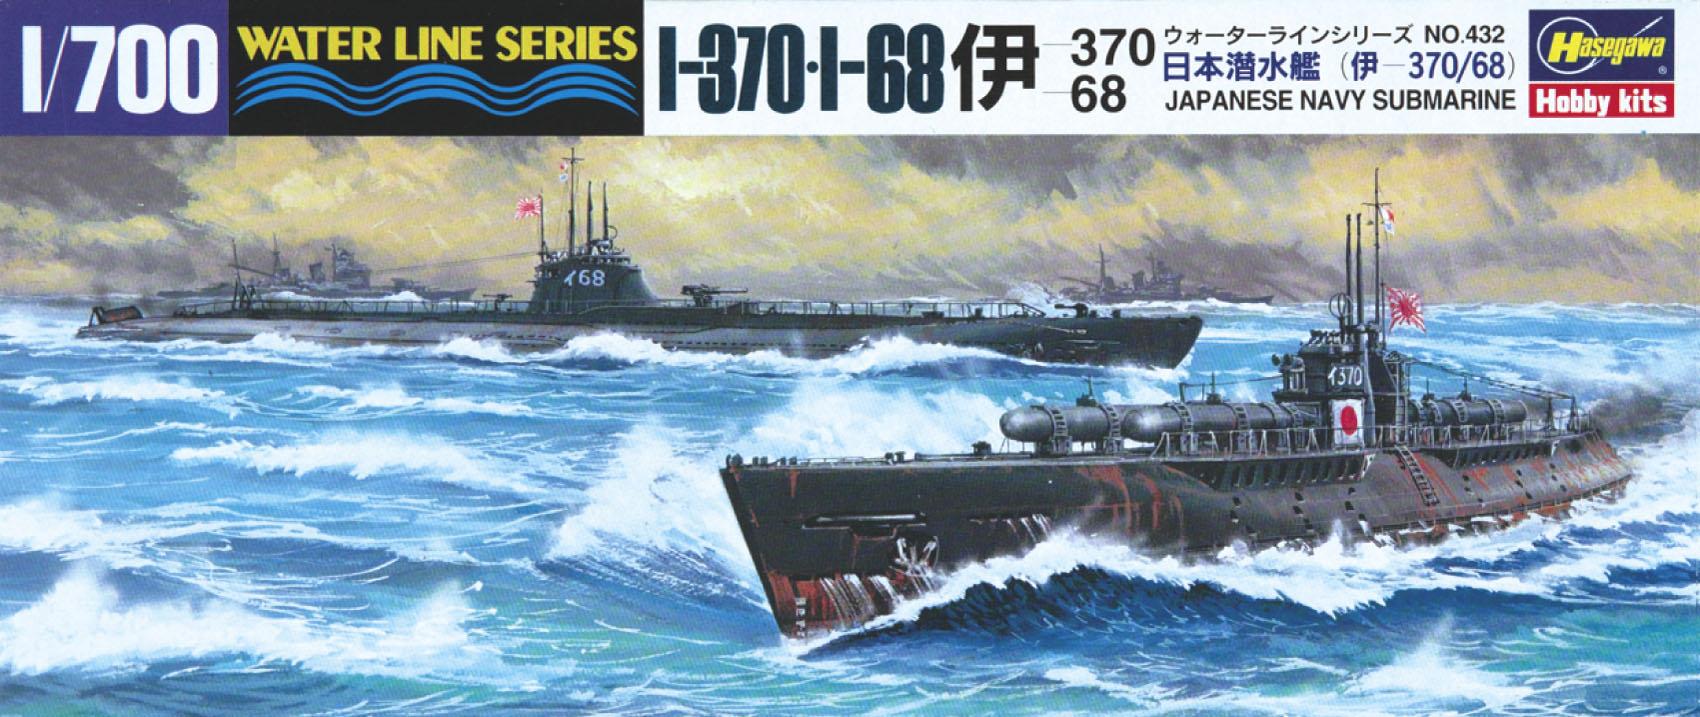 Hasegawa Submarine I-370/I-68